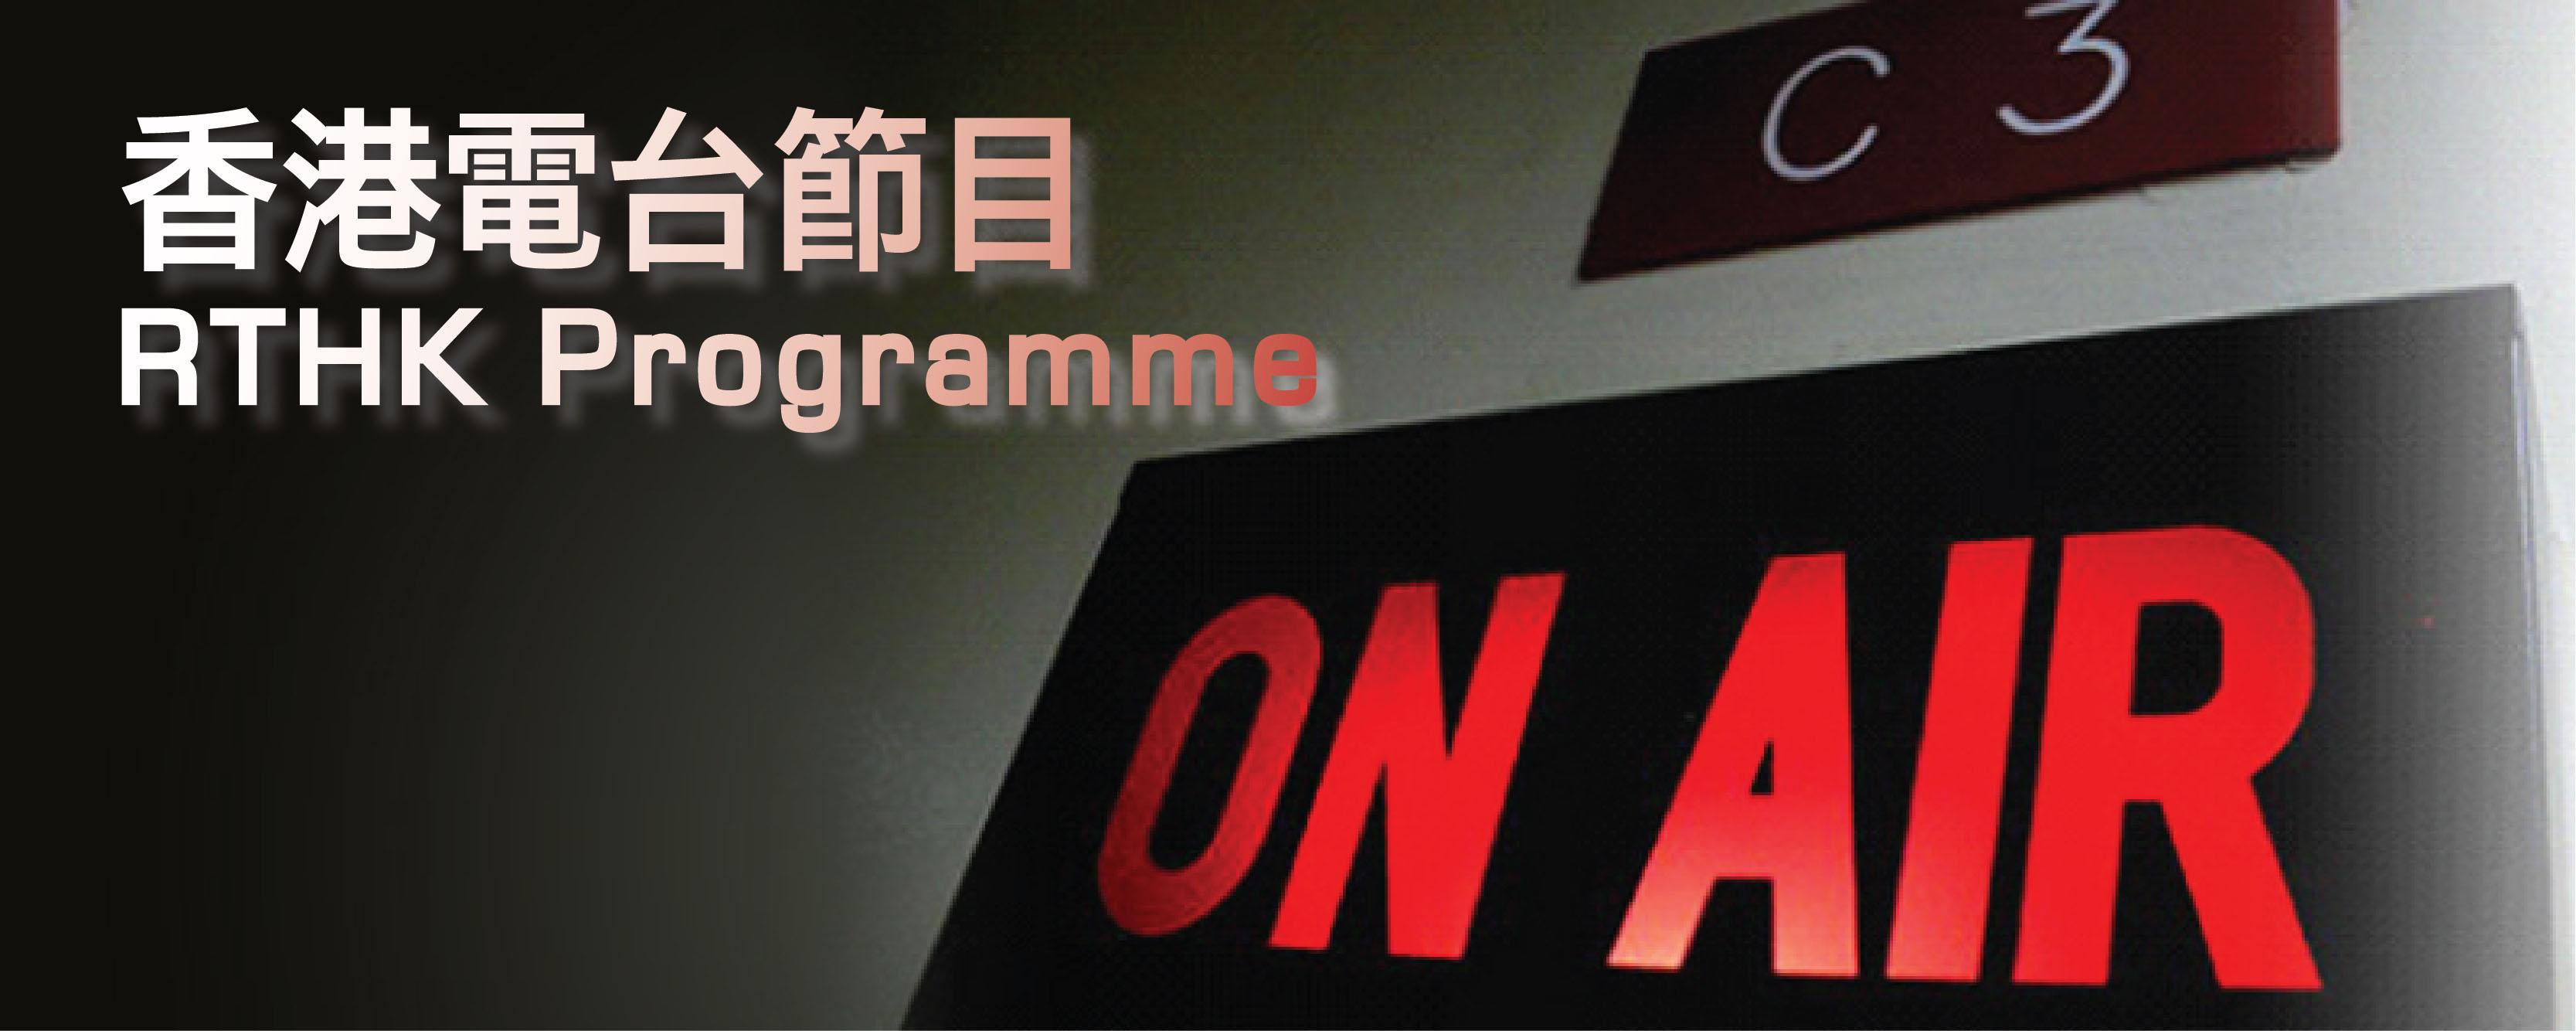 RTHK Programme